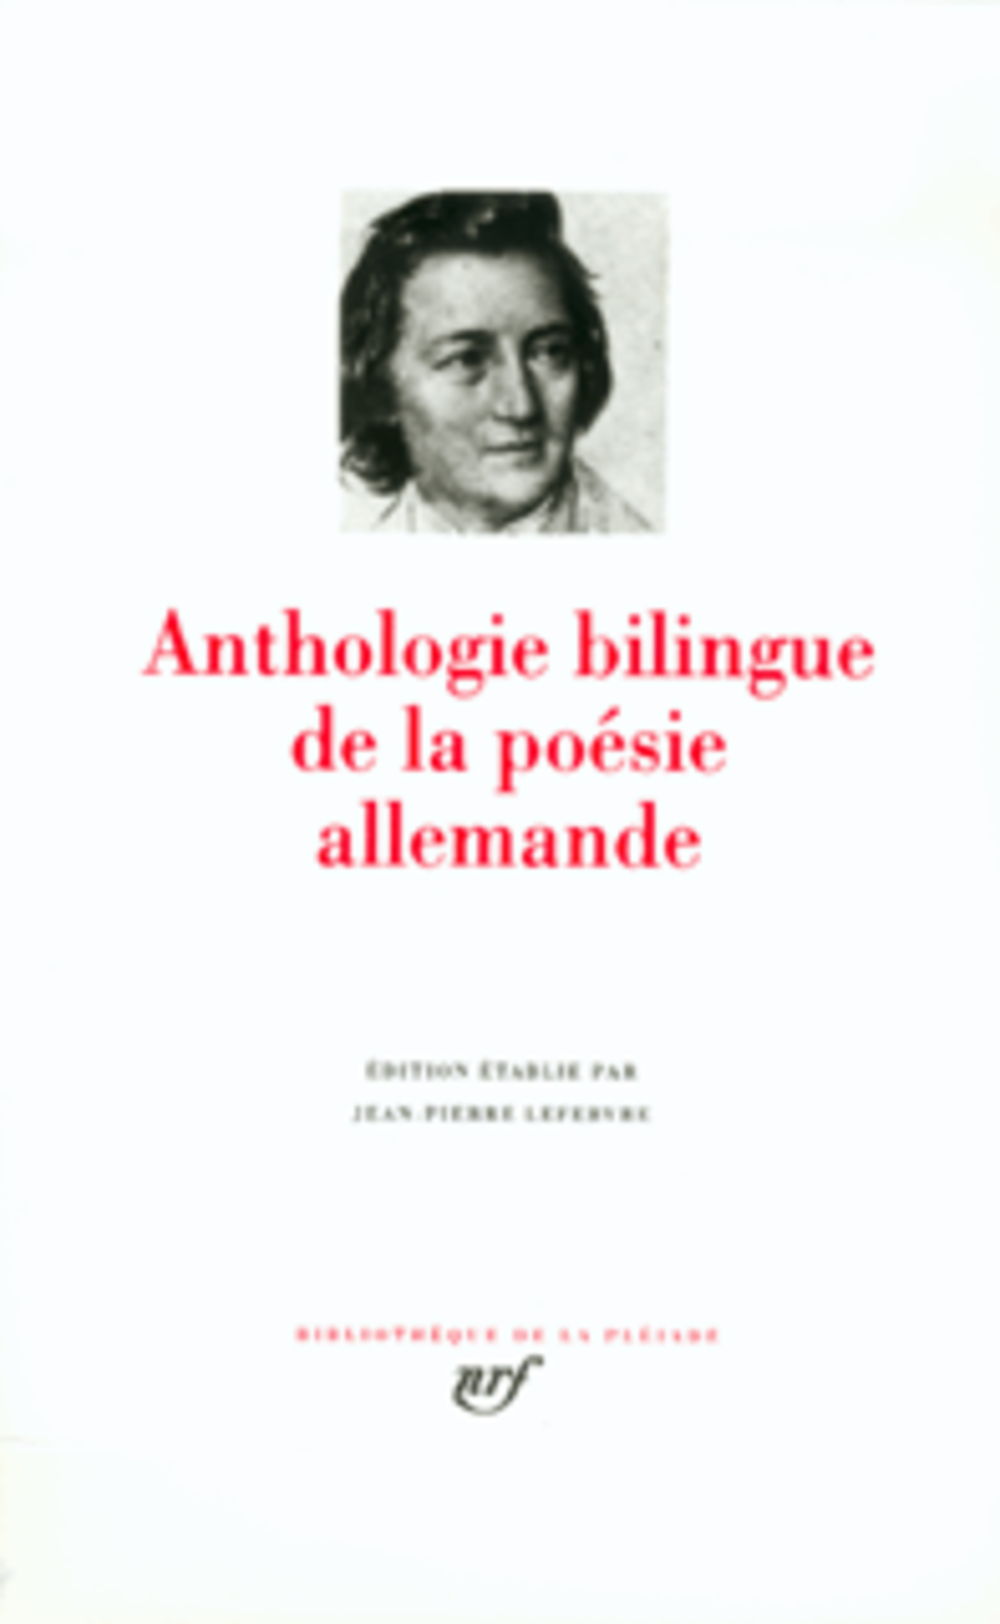 ANTHOLOGIE BILINGUE DE LA POESIE ALLEMANDE COLLECTIF GALLIMARD